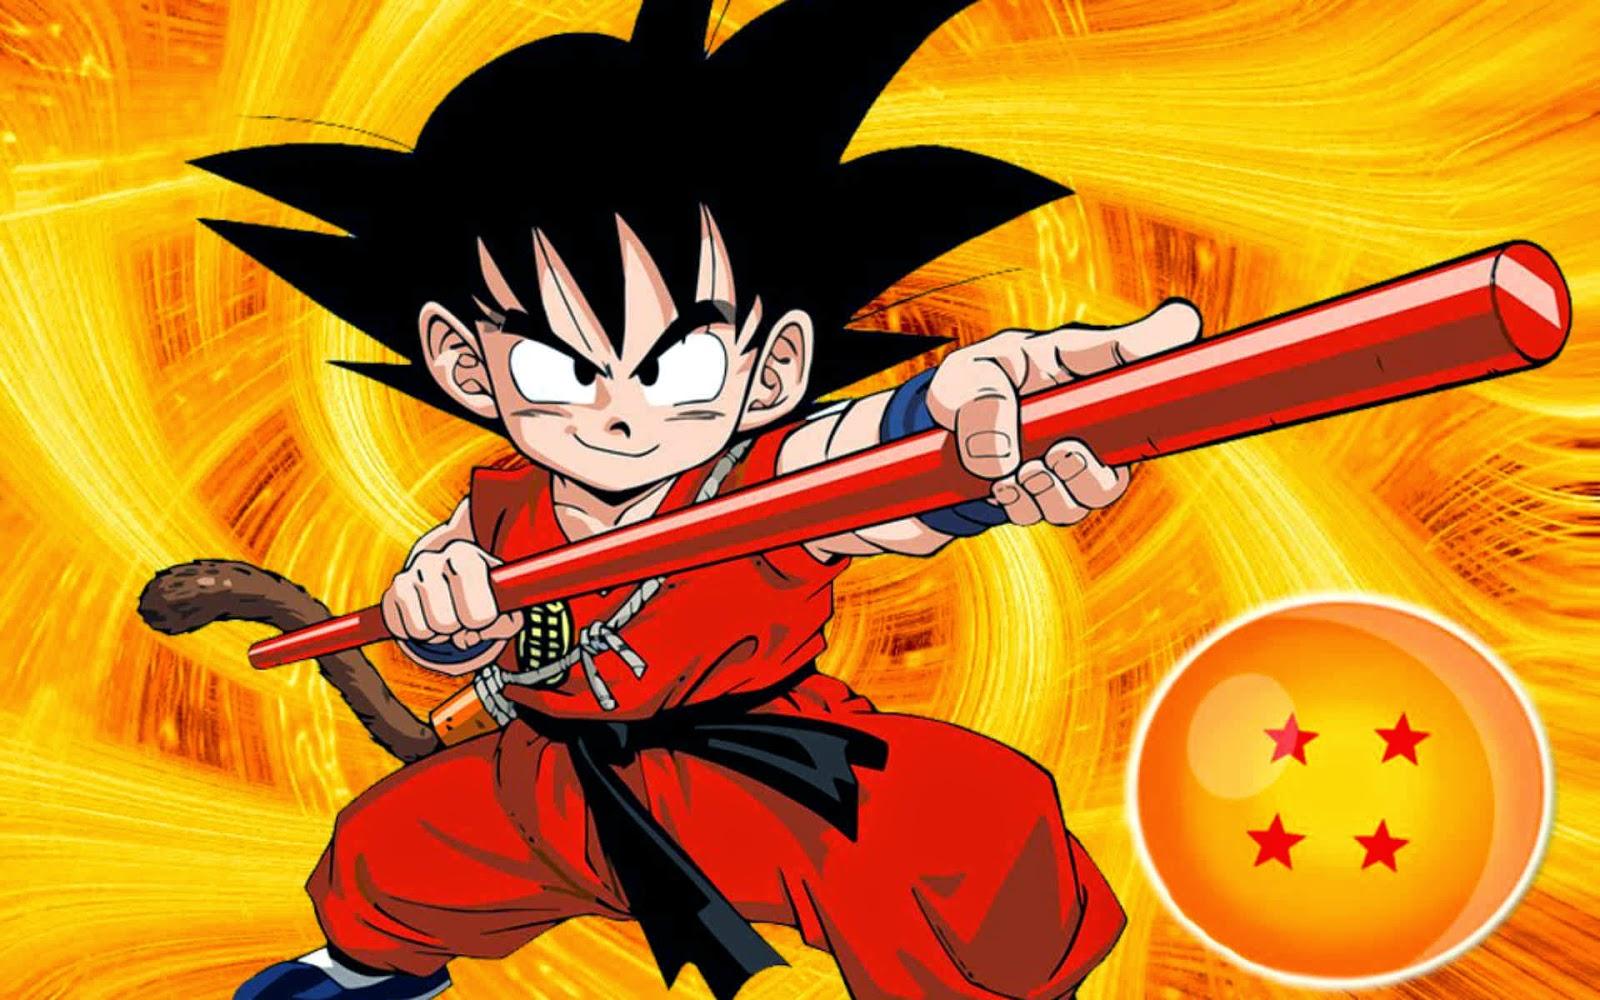 Dragon Ball Wallpaper Goku Dragon Ball Kid Goku Wallpaper - Dragon Ball Z Mystical Adventure Dvd Cover , HD Wallpaper & Backgrounds